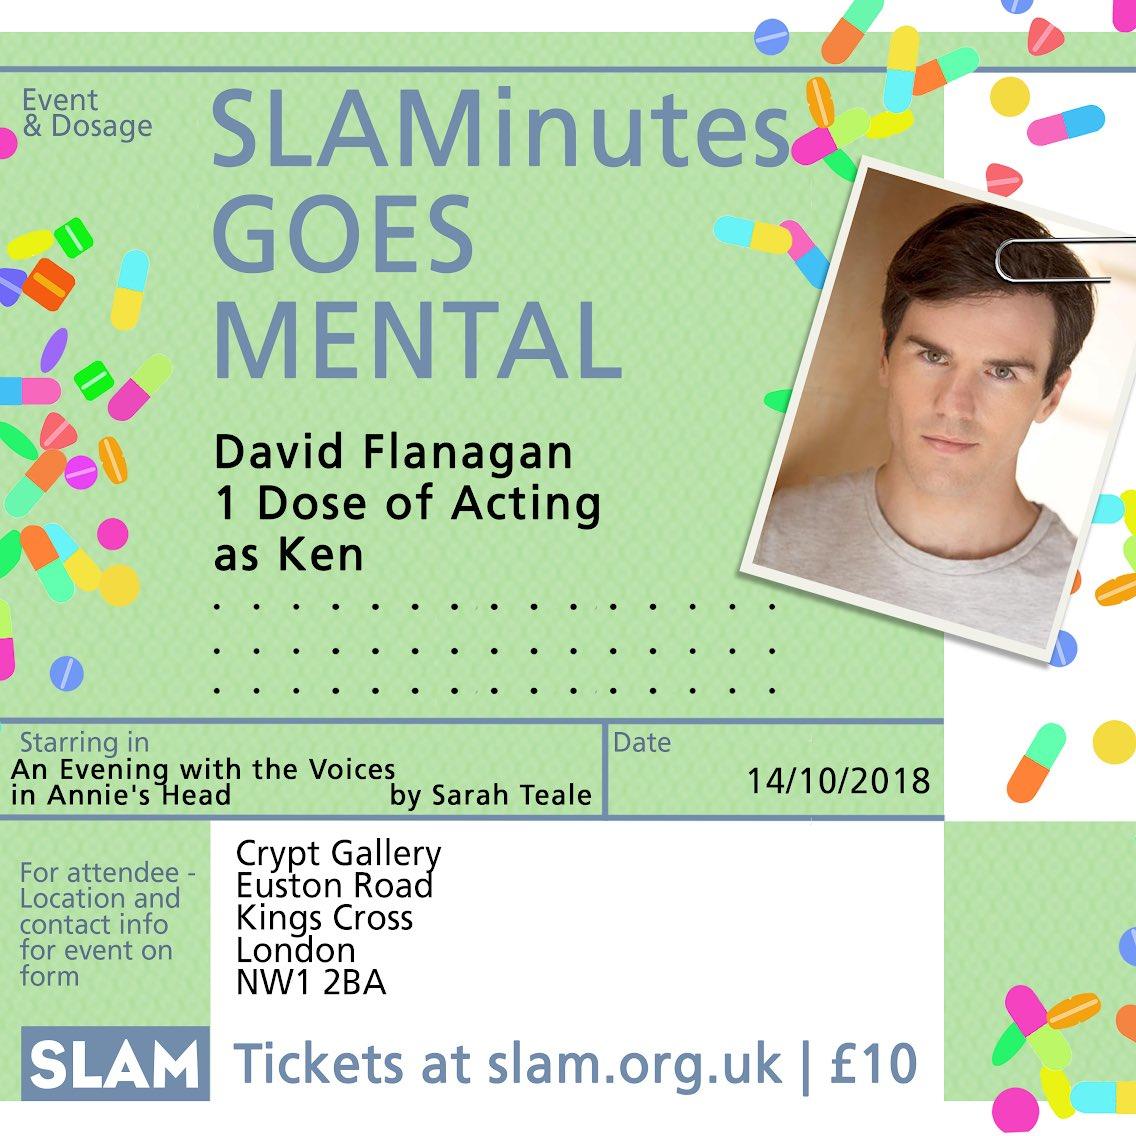 🤩The amazing cast for #SLAMinutes goes #mental ...🤩⠀ .⠀ Starring the blummin brilliant @DavidGFlanagan  .⠀ 14th October ⠀ TICKETS https://buff.ly/2OOjAO8⠀ .⠀ #slamkings #mentalhealth #mentalhealthawareness #acting #actorslife #monologue #performance #stage #newwriting